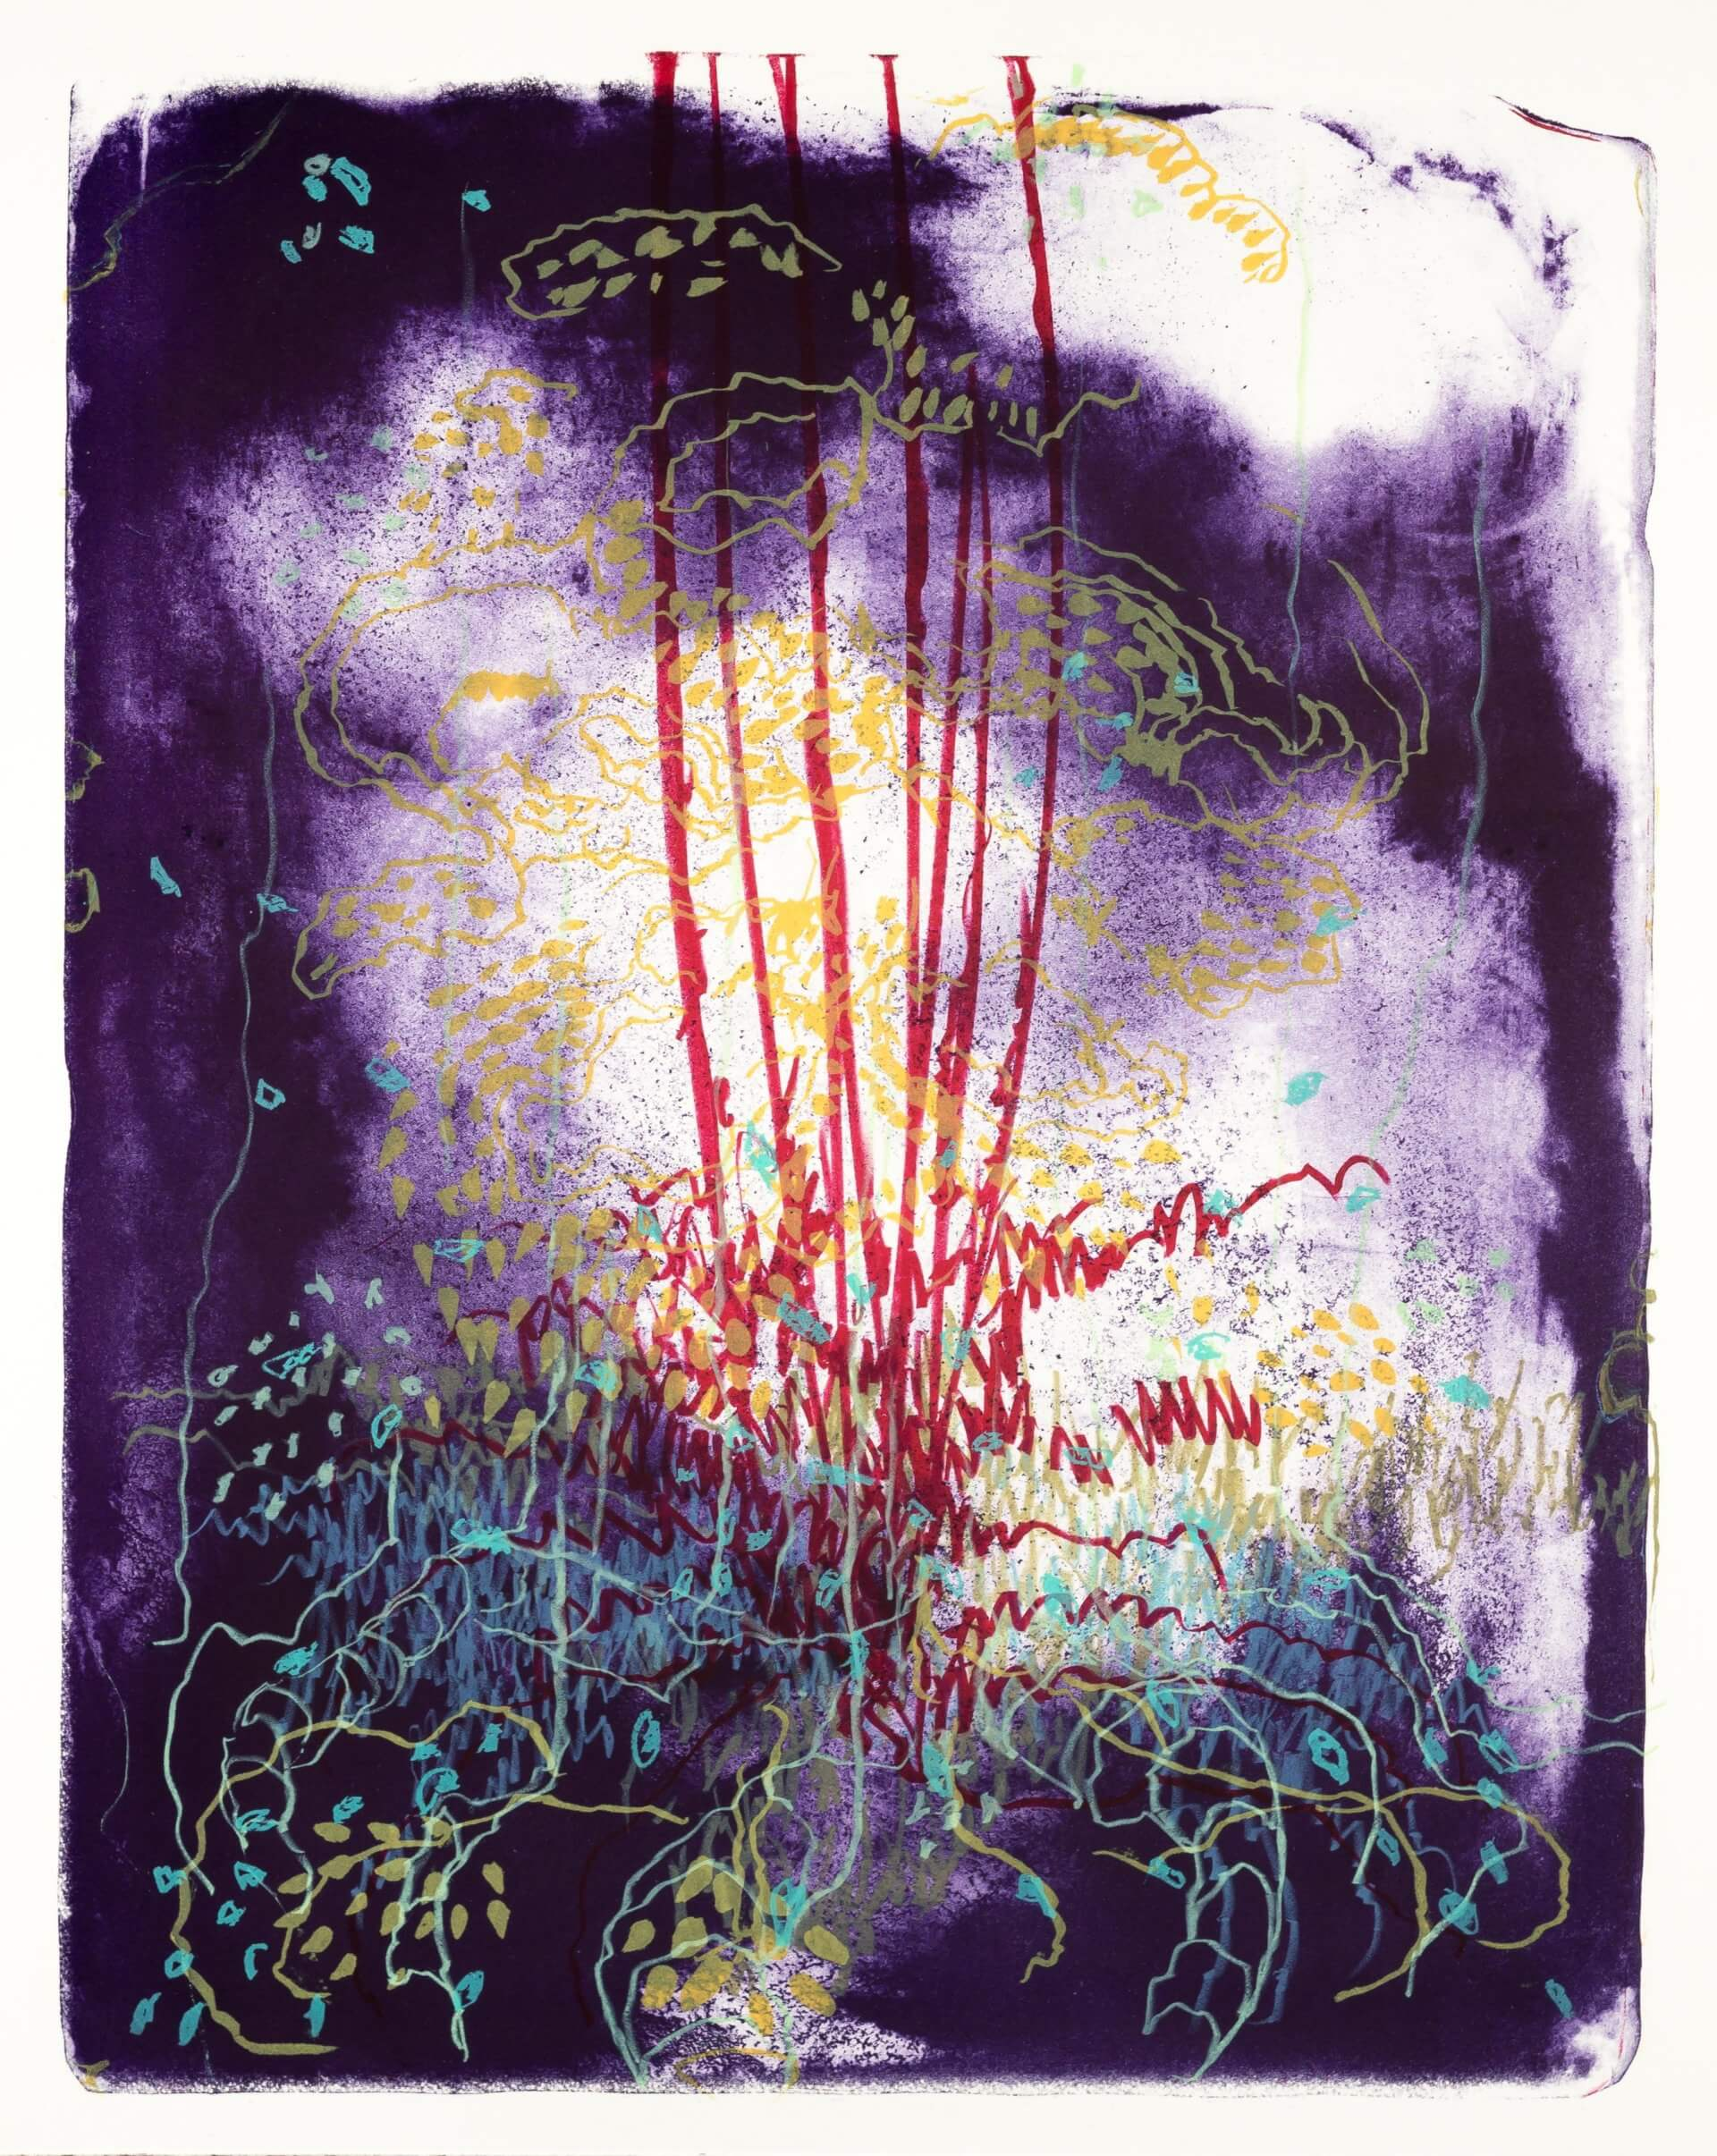 Wald X(D)-I, 2019, Farblithographie, Unikat, 50x40 cm